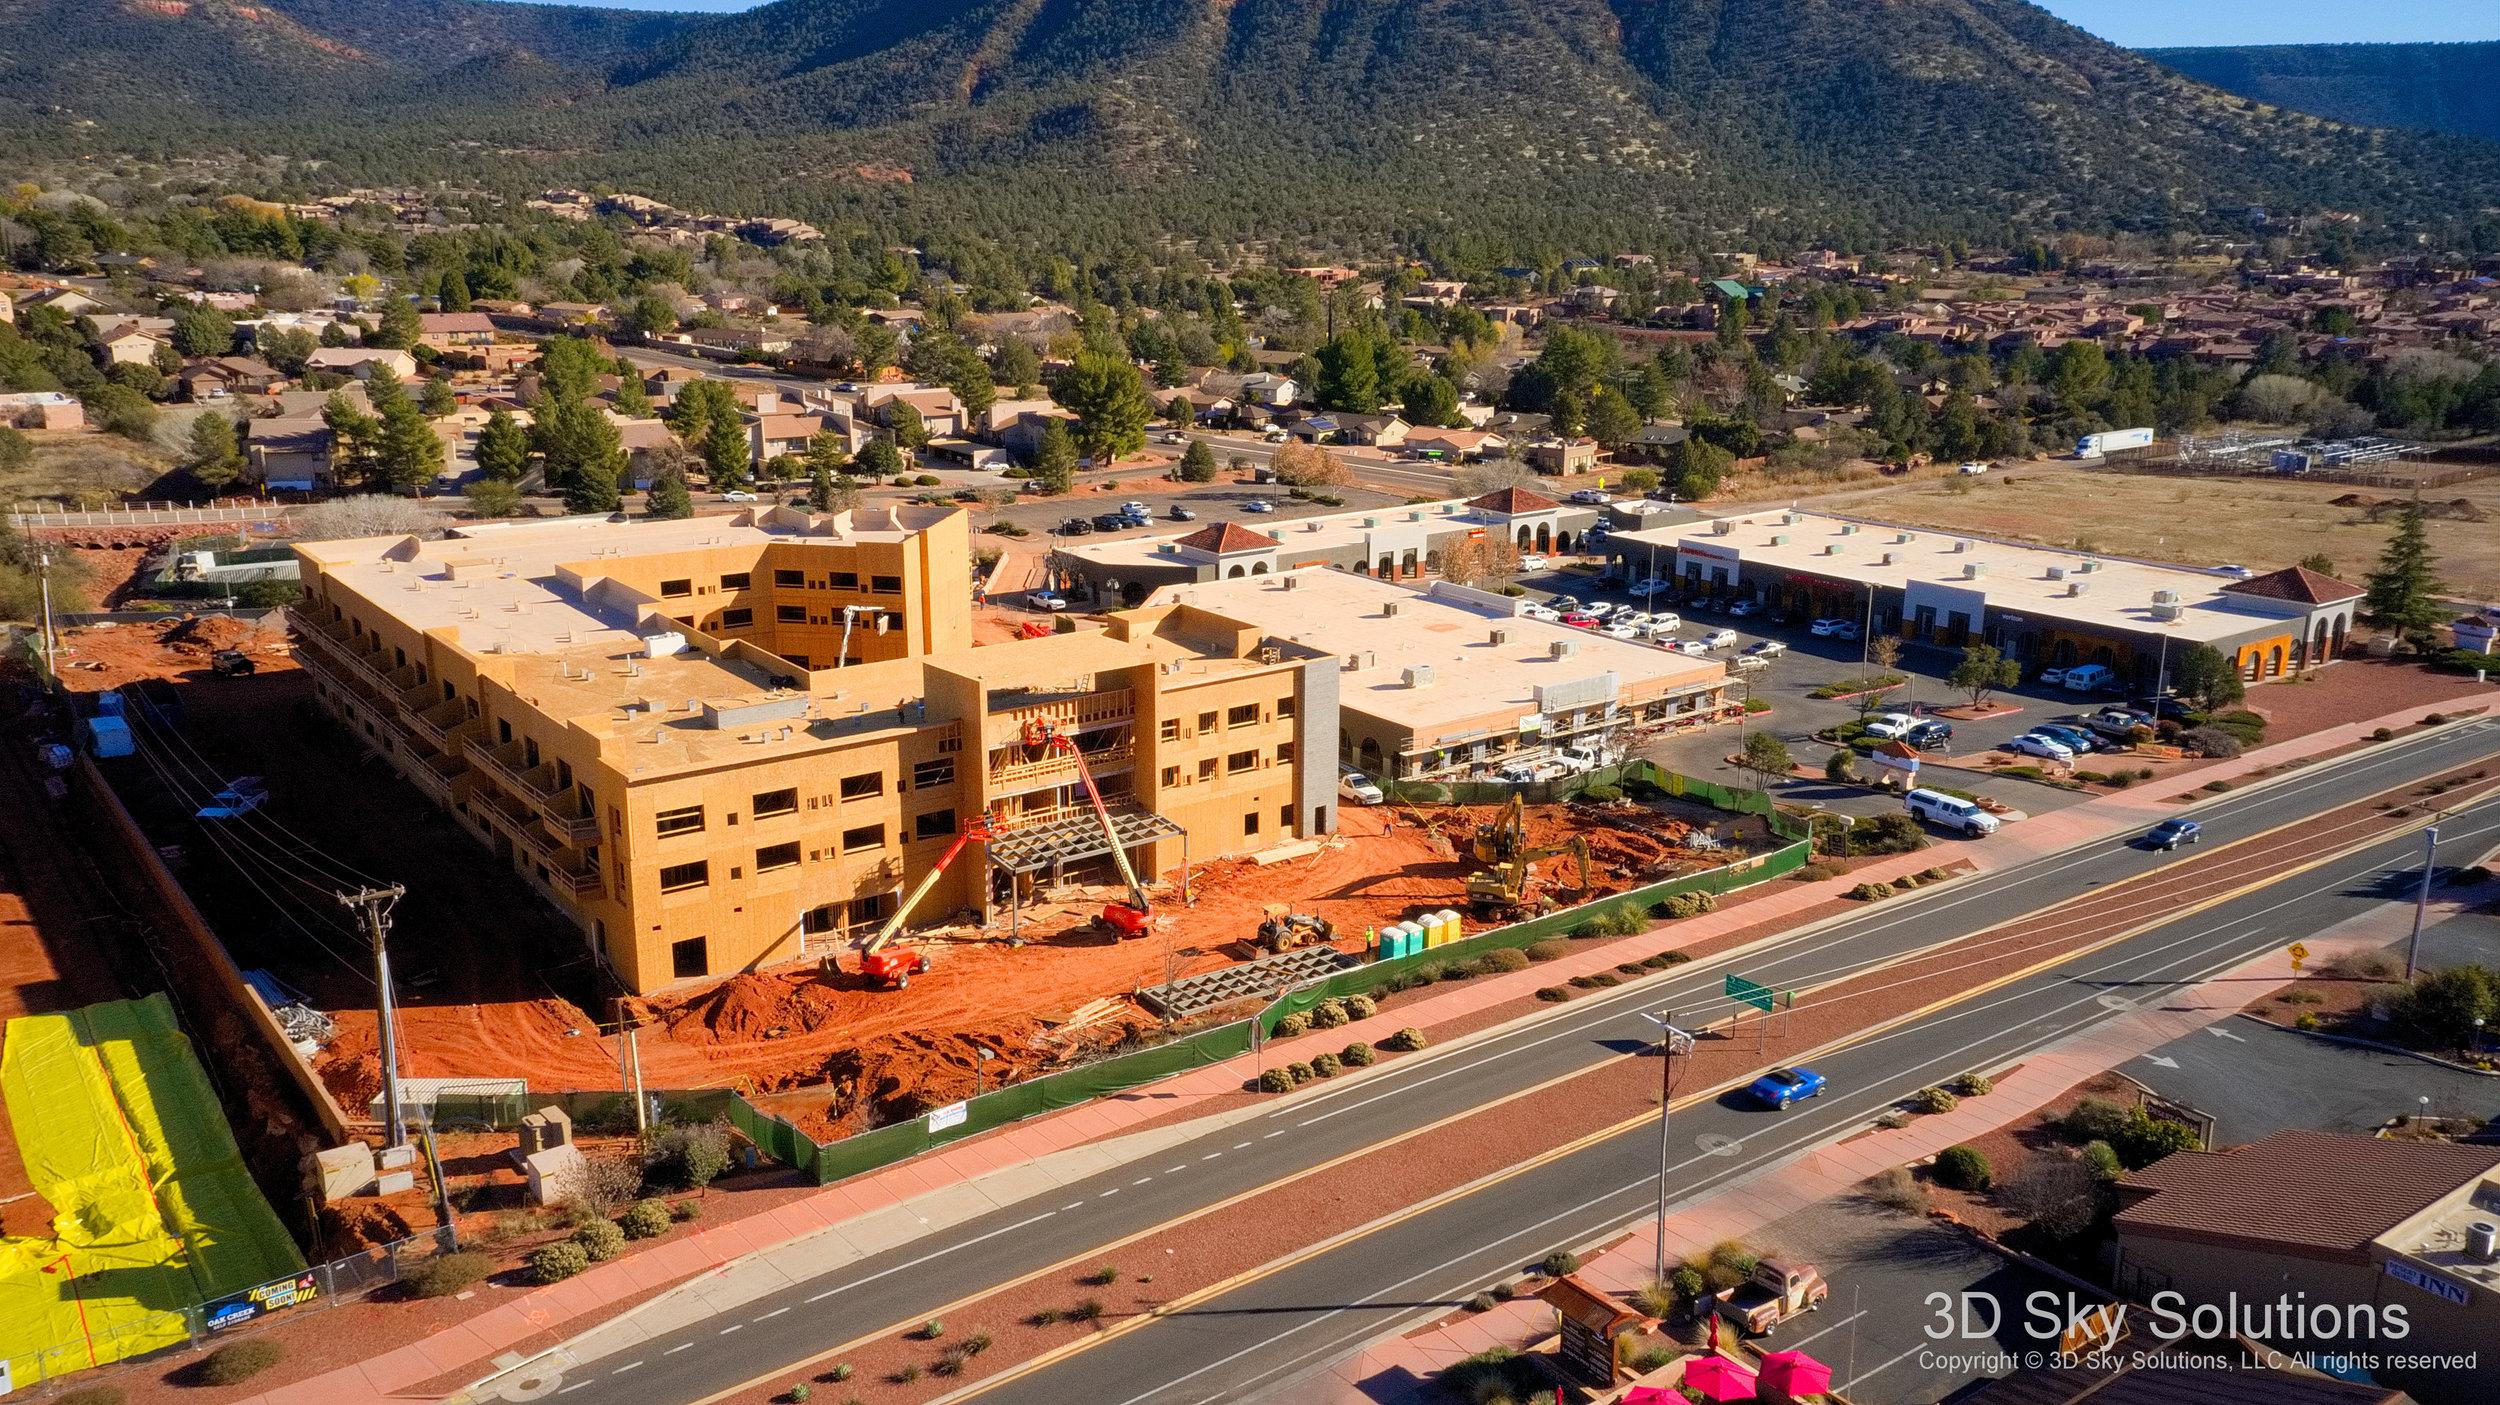 SEDONA VISTA VILLAGE (FORMER FACTORY OUTLET MALL)    6601 SR 179 - SEDONA, AZ